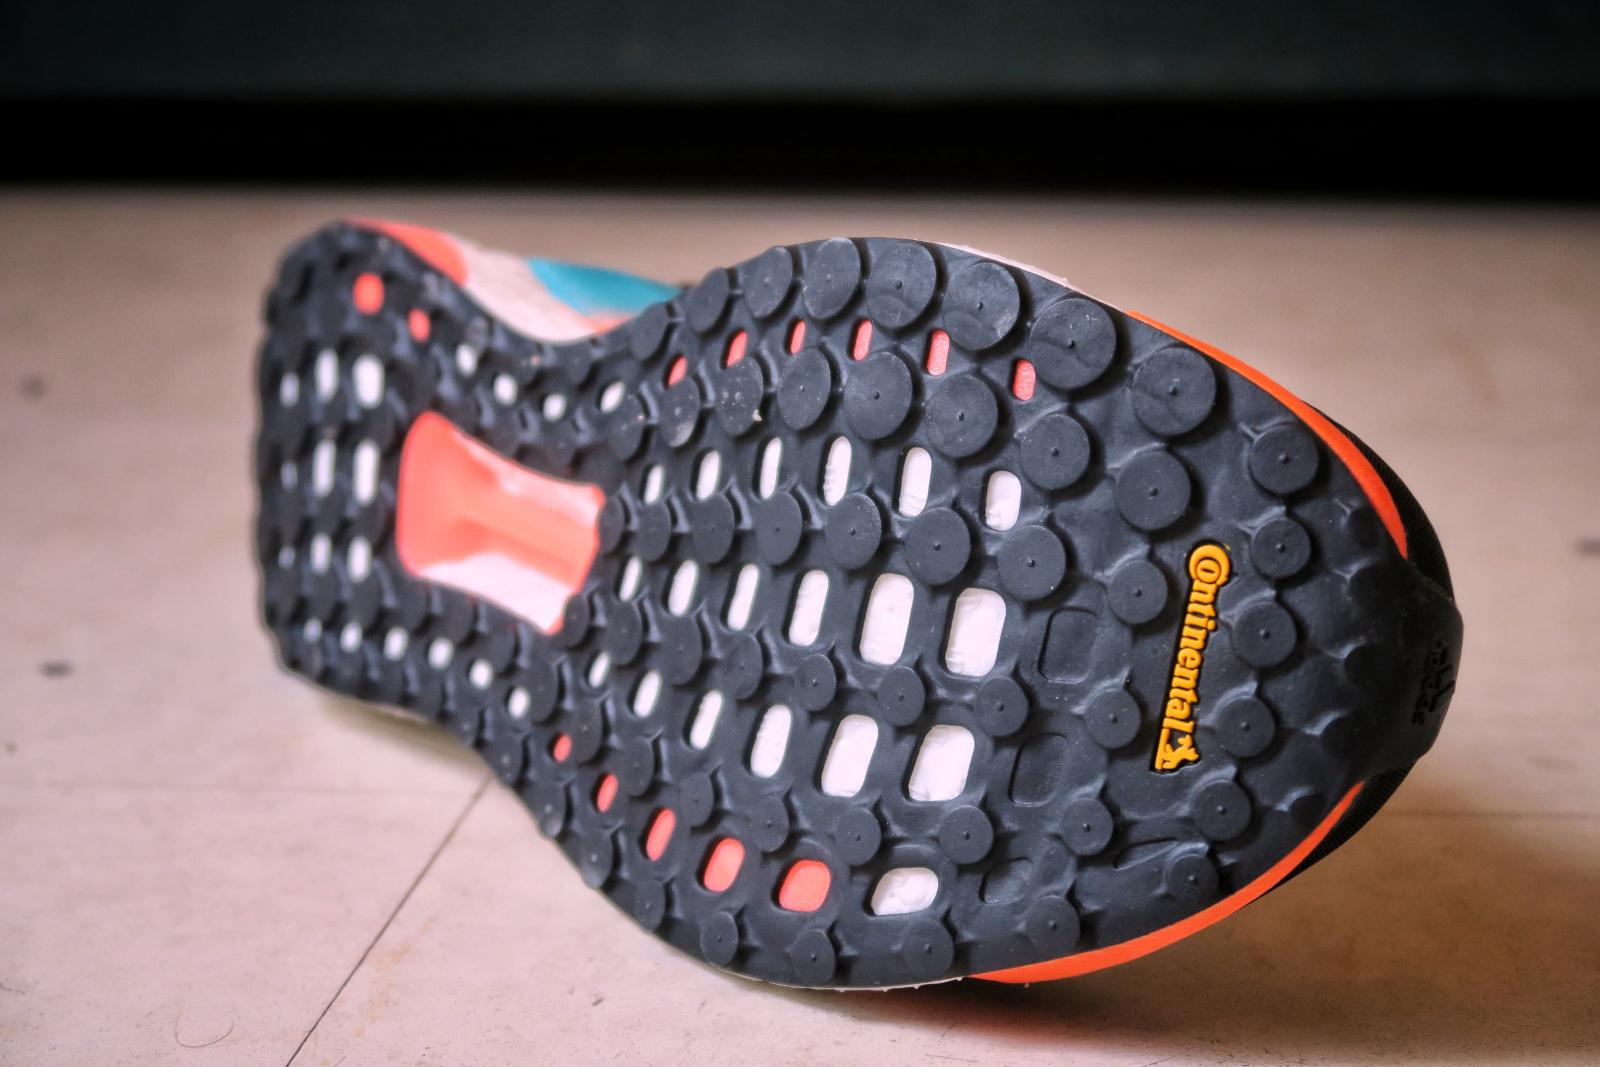 La semelle Continentale de l'Adidas Solar boost